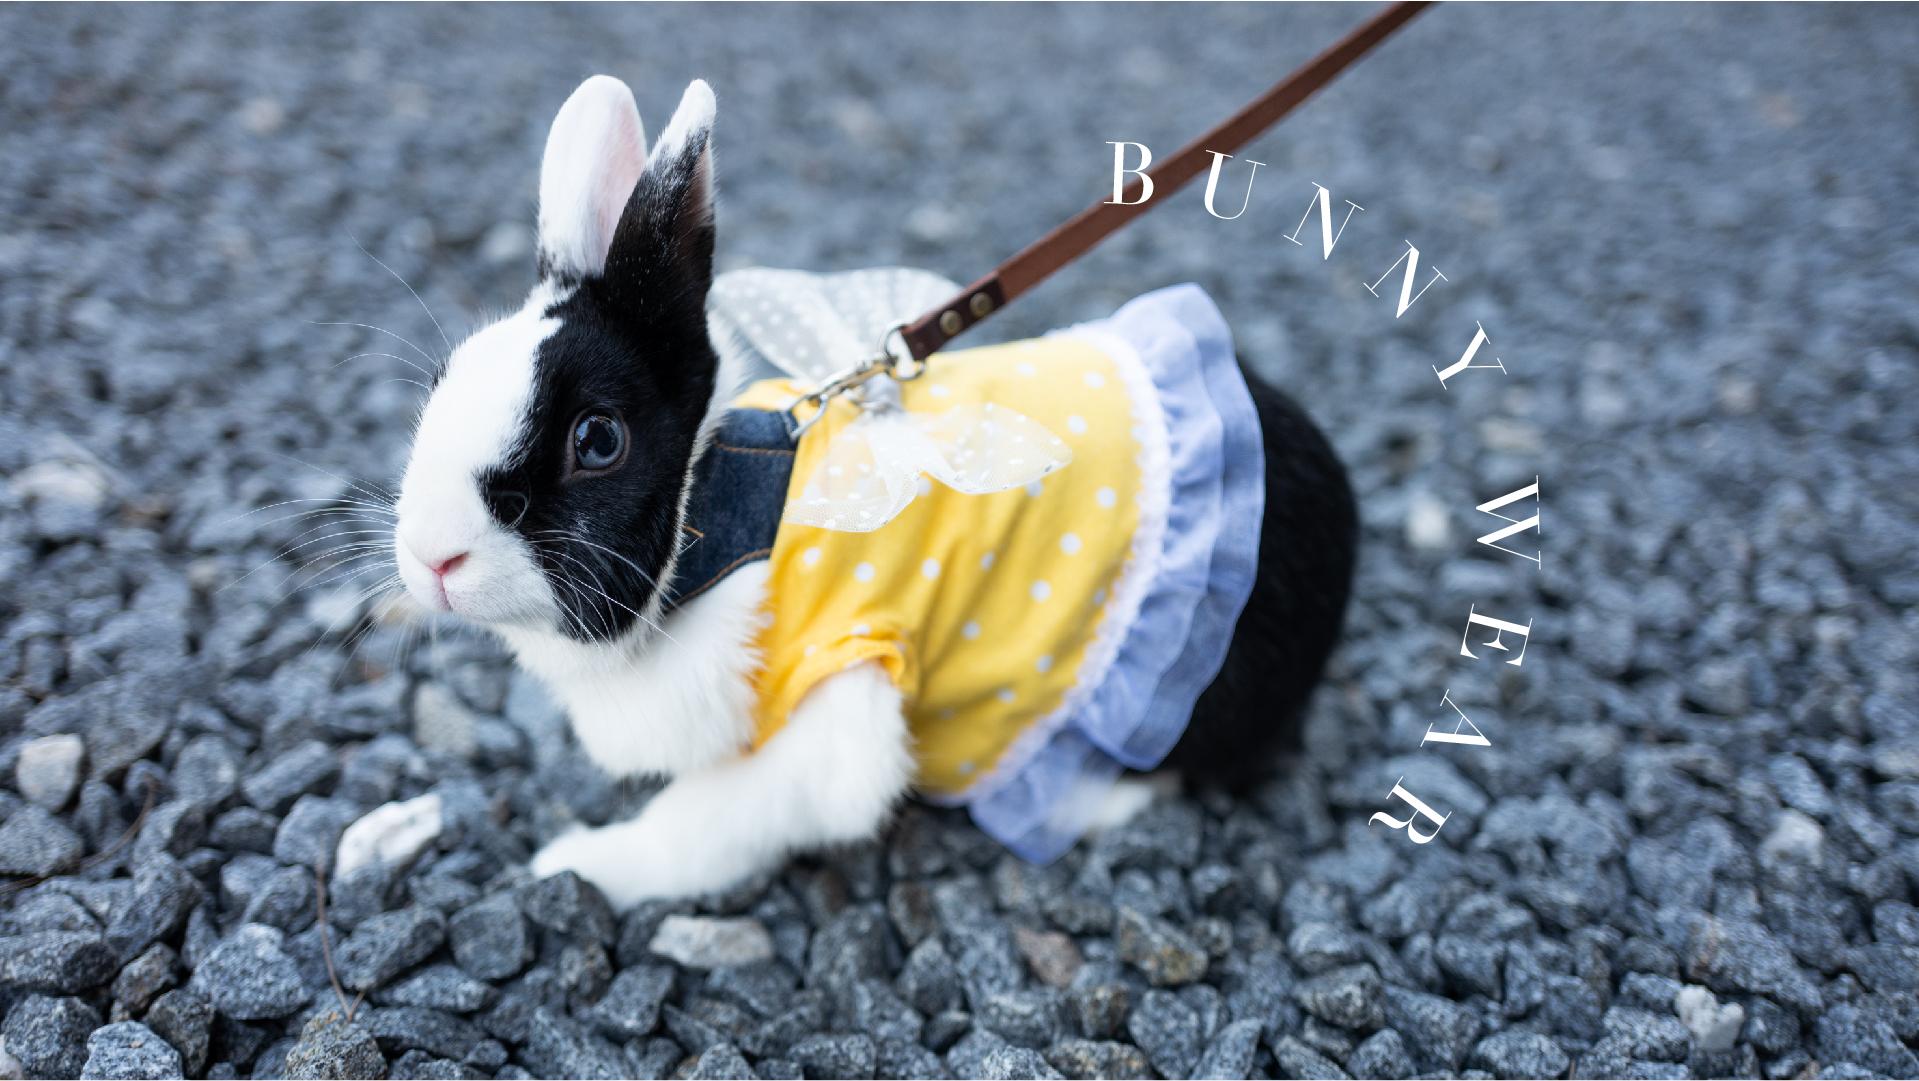 Bunny Wear